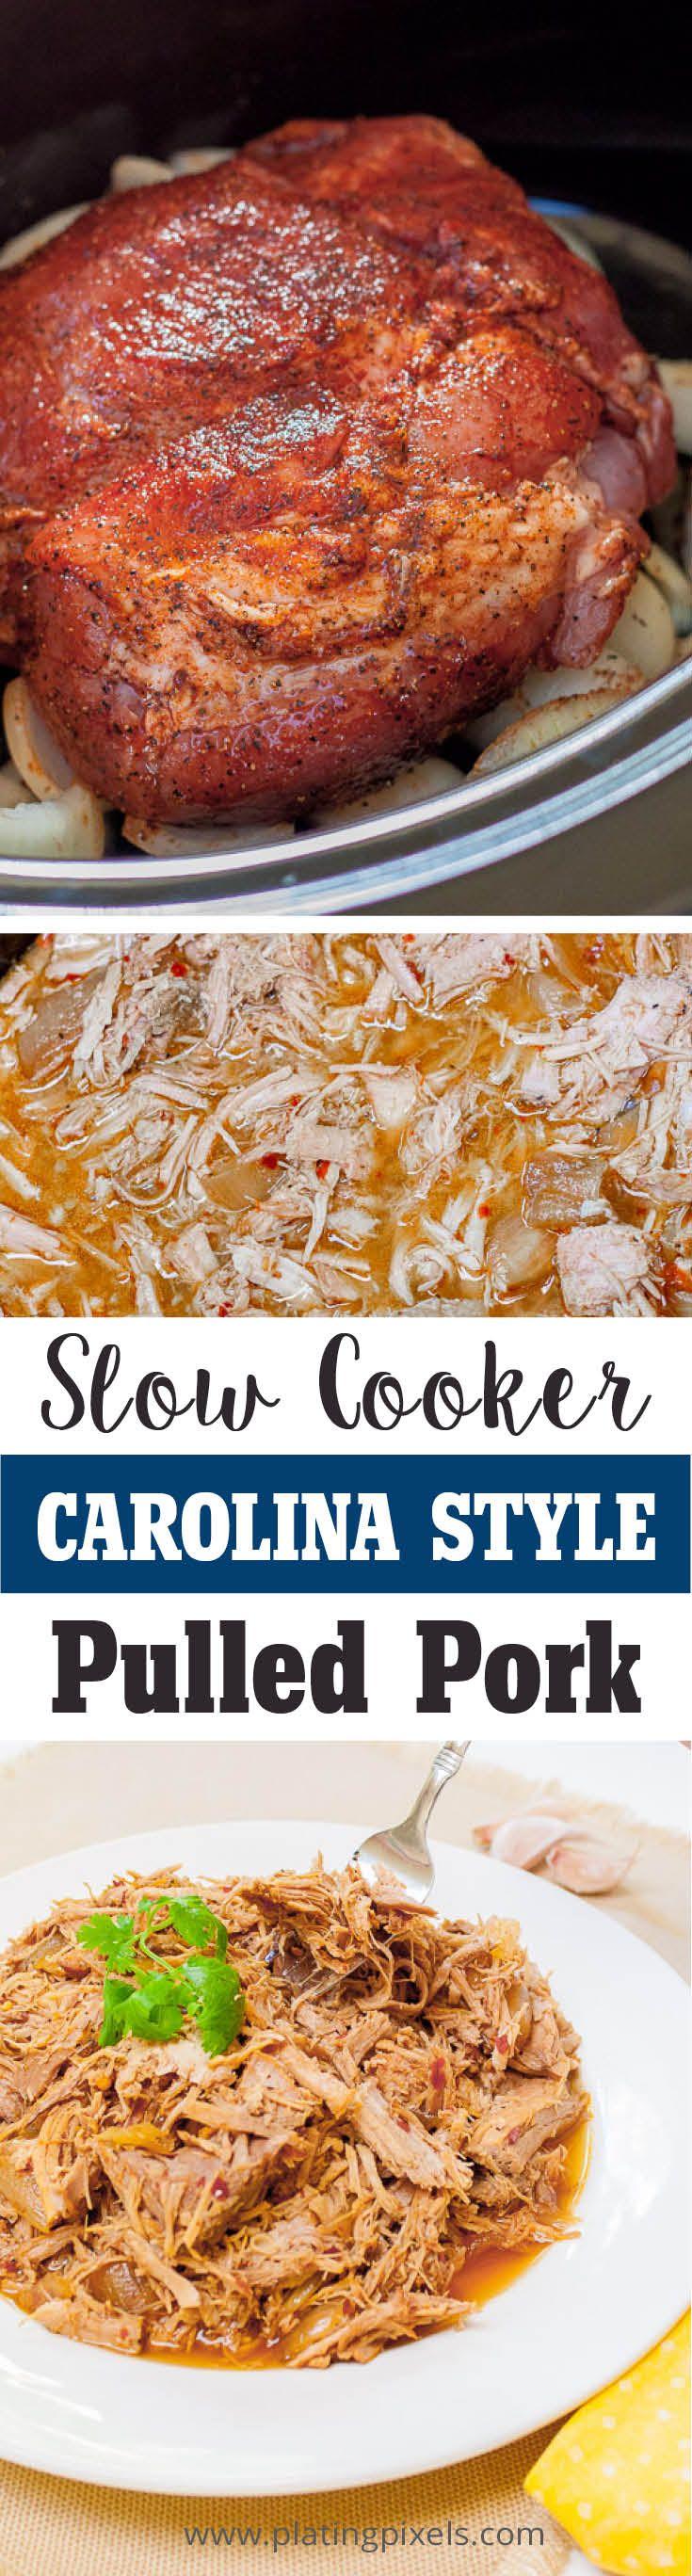 Carolina Style Slow Cooker Pulled Pork | Recipe | Pulled Pork, Pulled ...